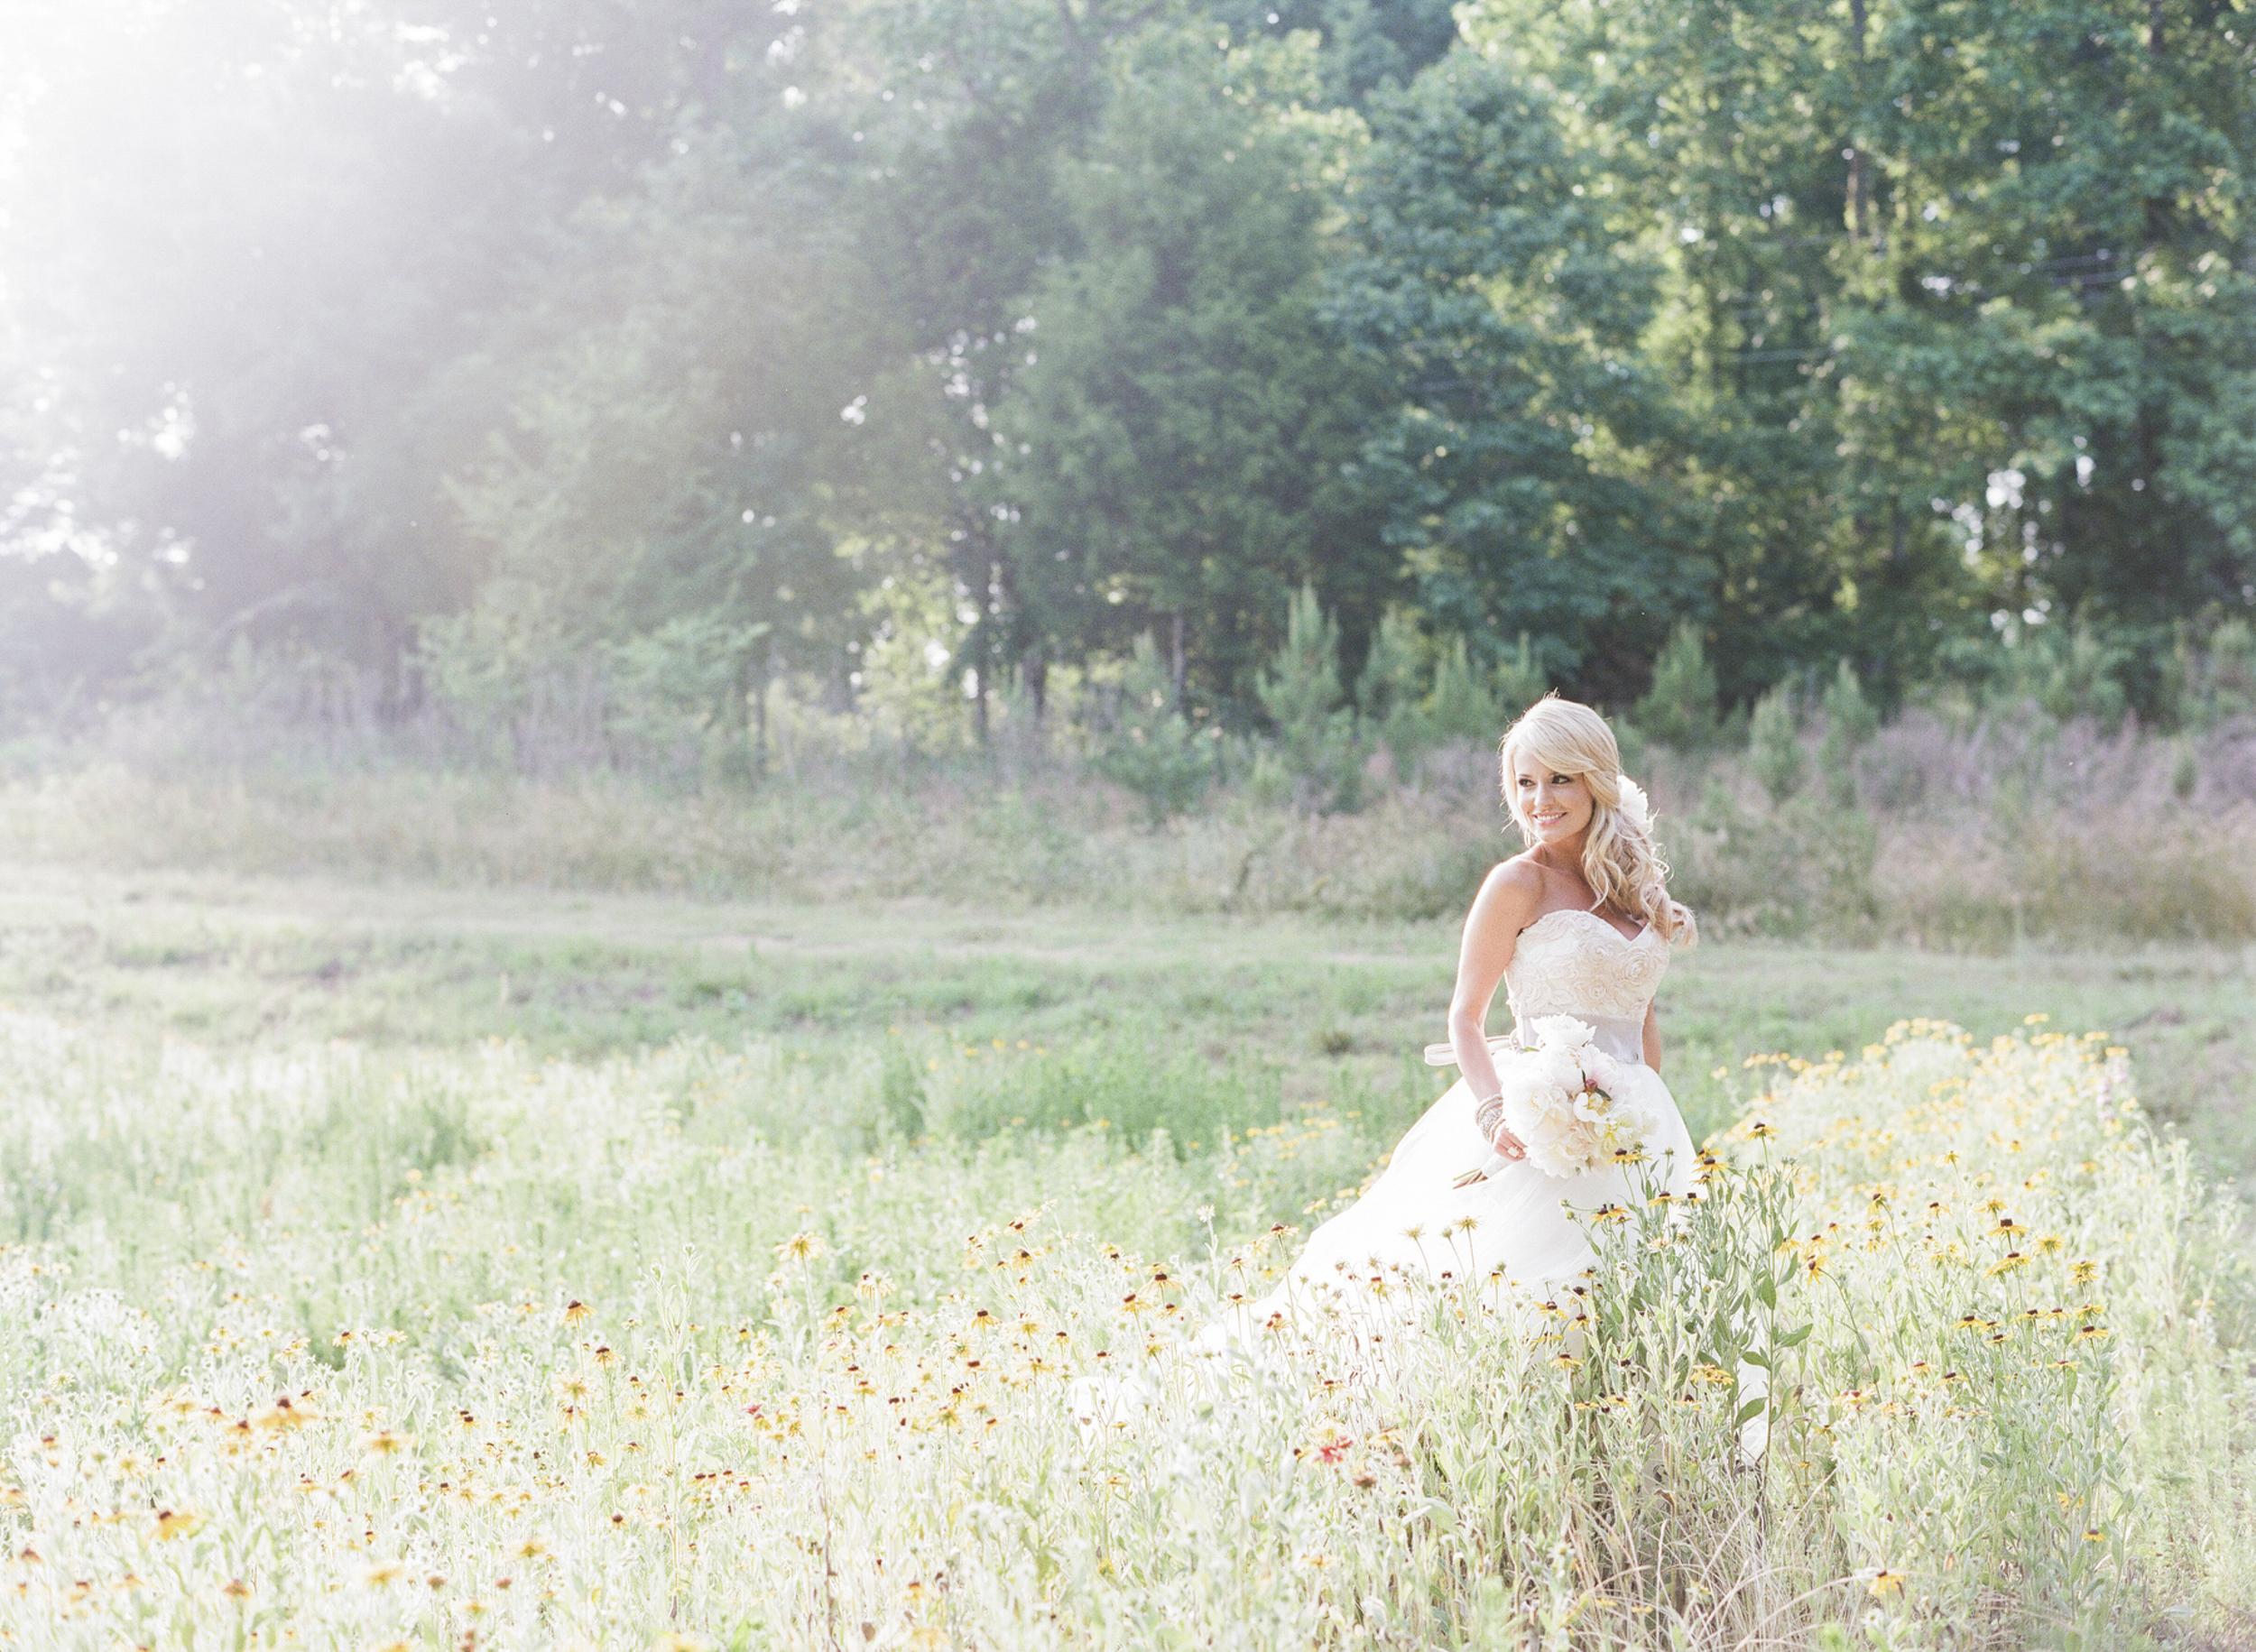 south_carolina_farm_wedding_rustic_chic_surprise_secret_luxe_wedding_bachelorette_emily_maynard_real_weddings-5.jpg